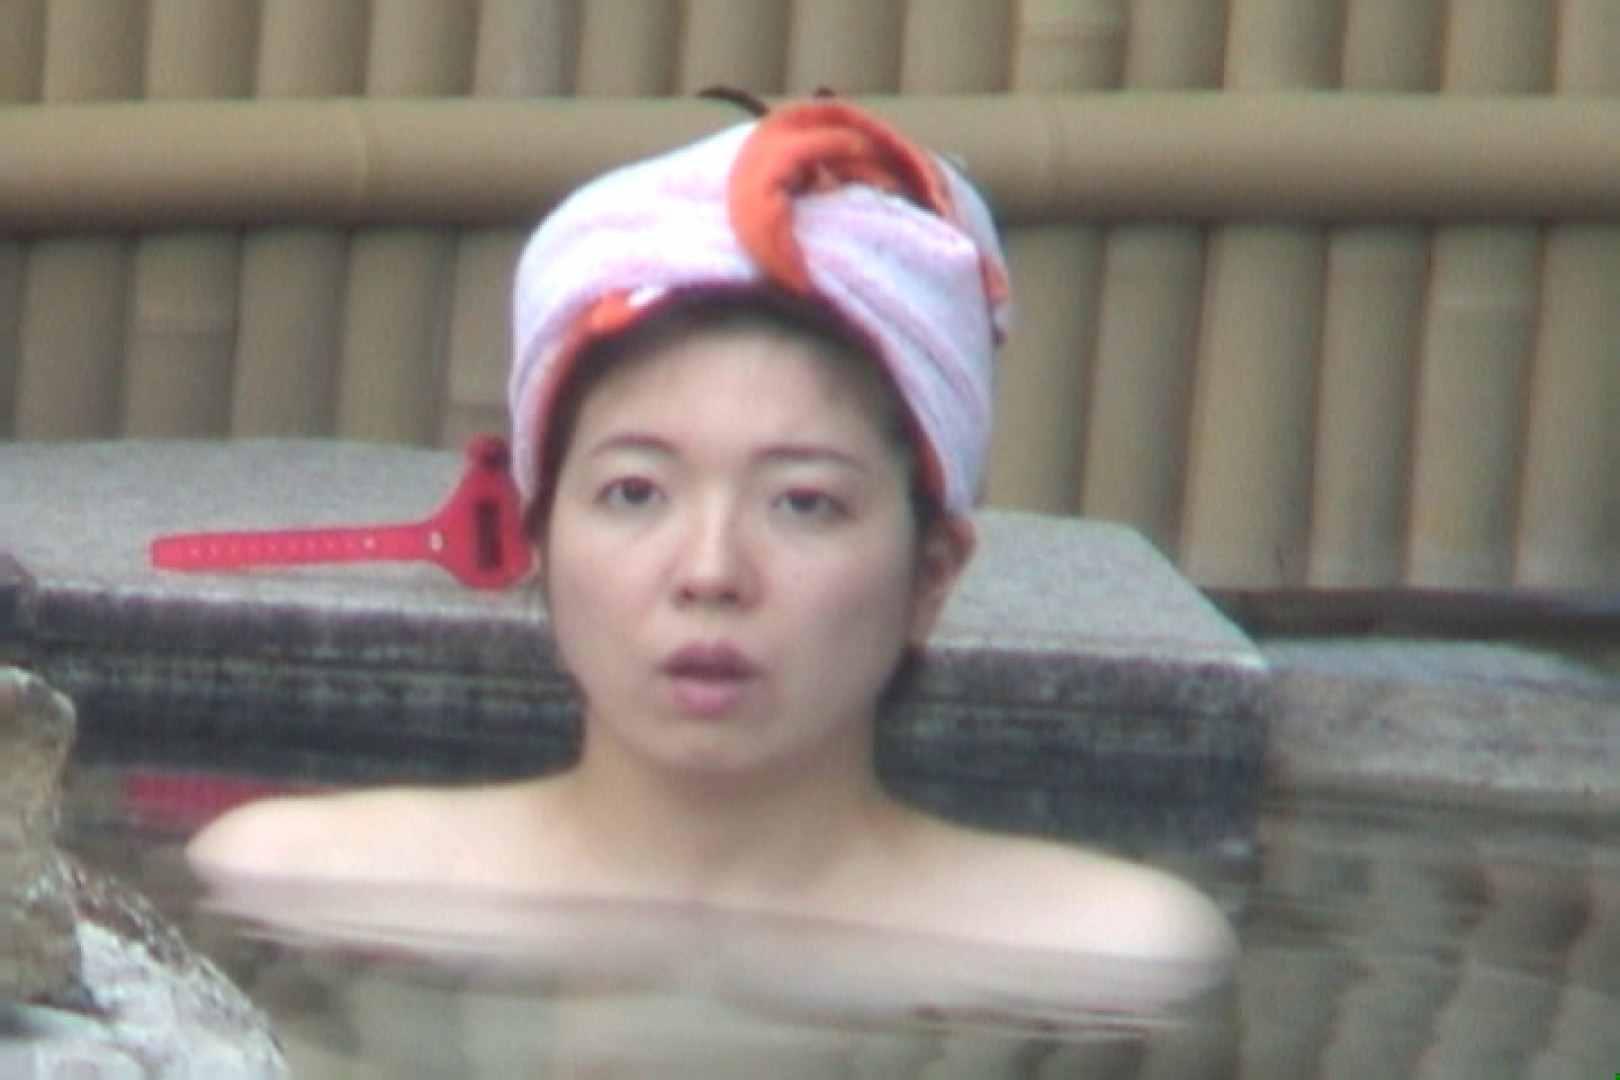 Aquaな露天風呂Vol.573 盗撮シリーズ | 露天風呂編  78PIX 73